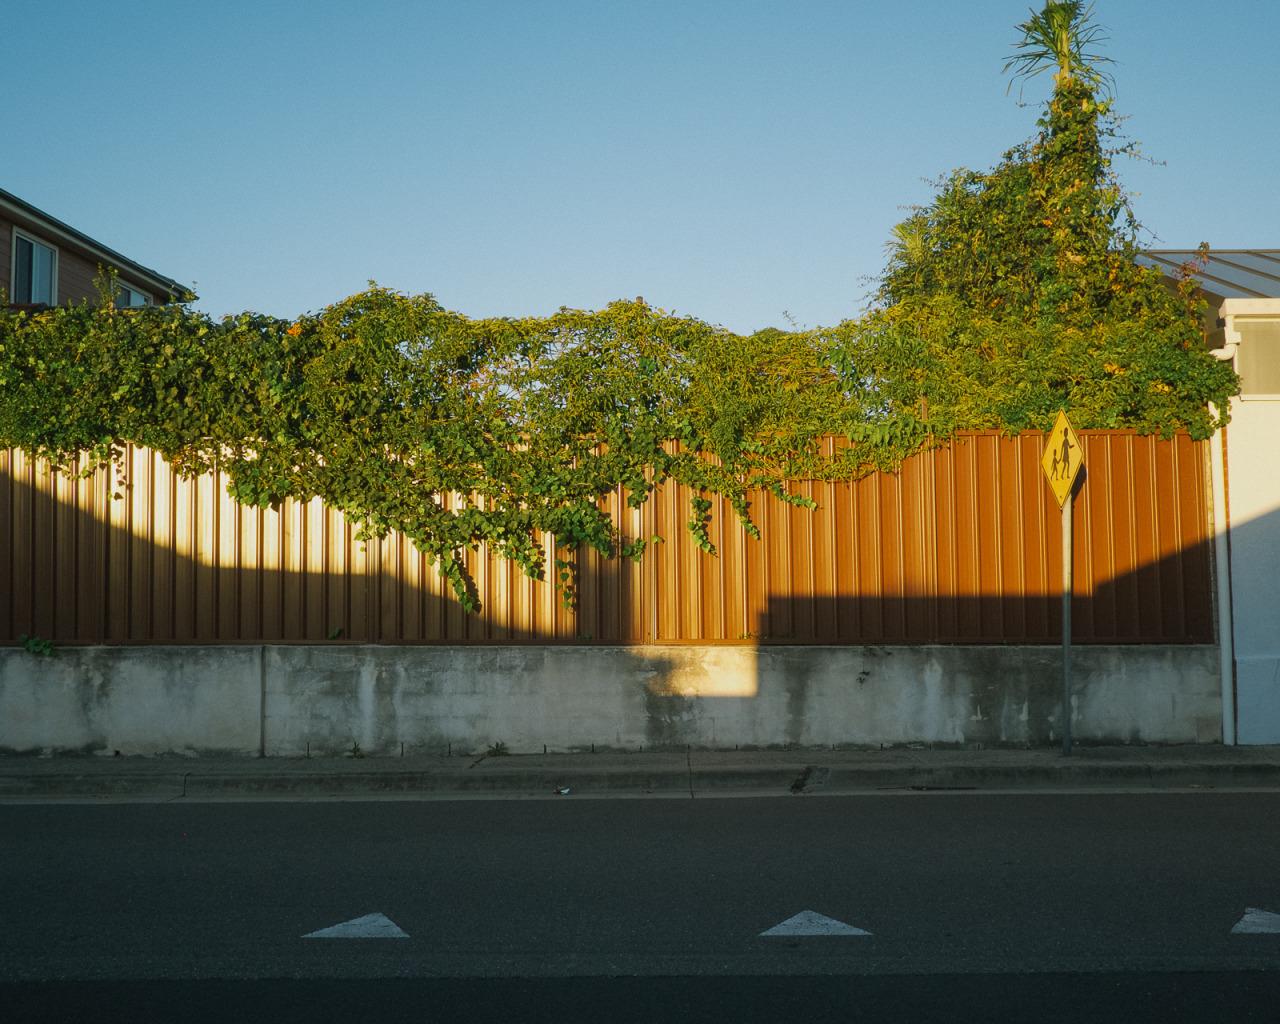 #suburbia #BrightonLeSands #sydney